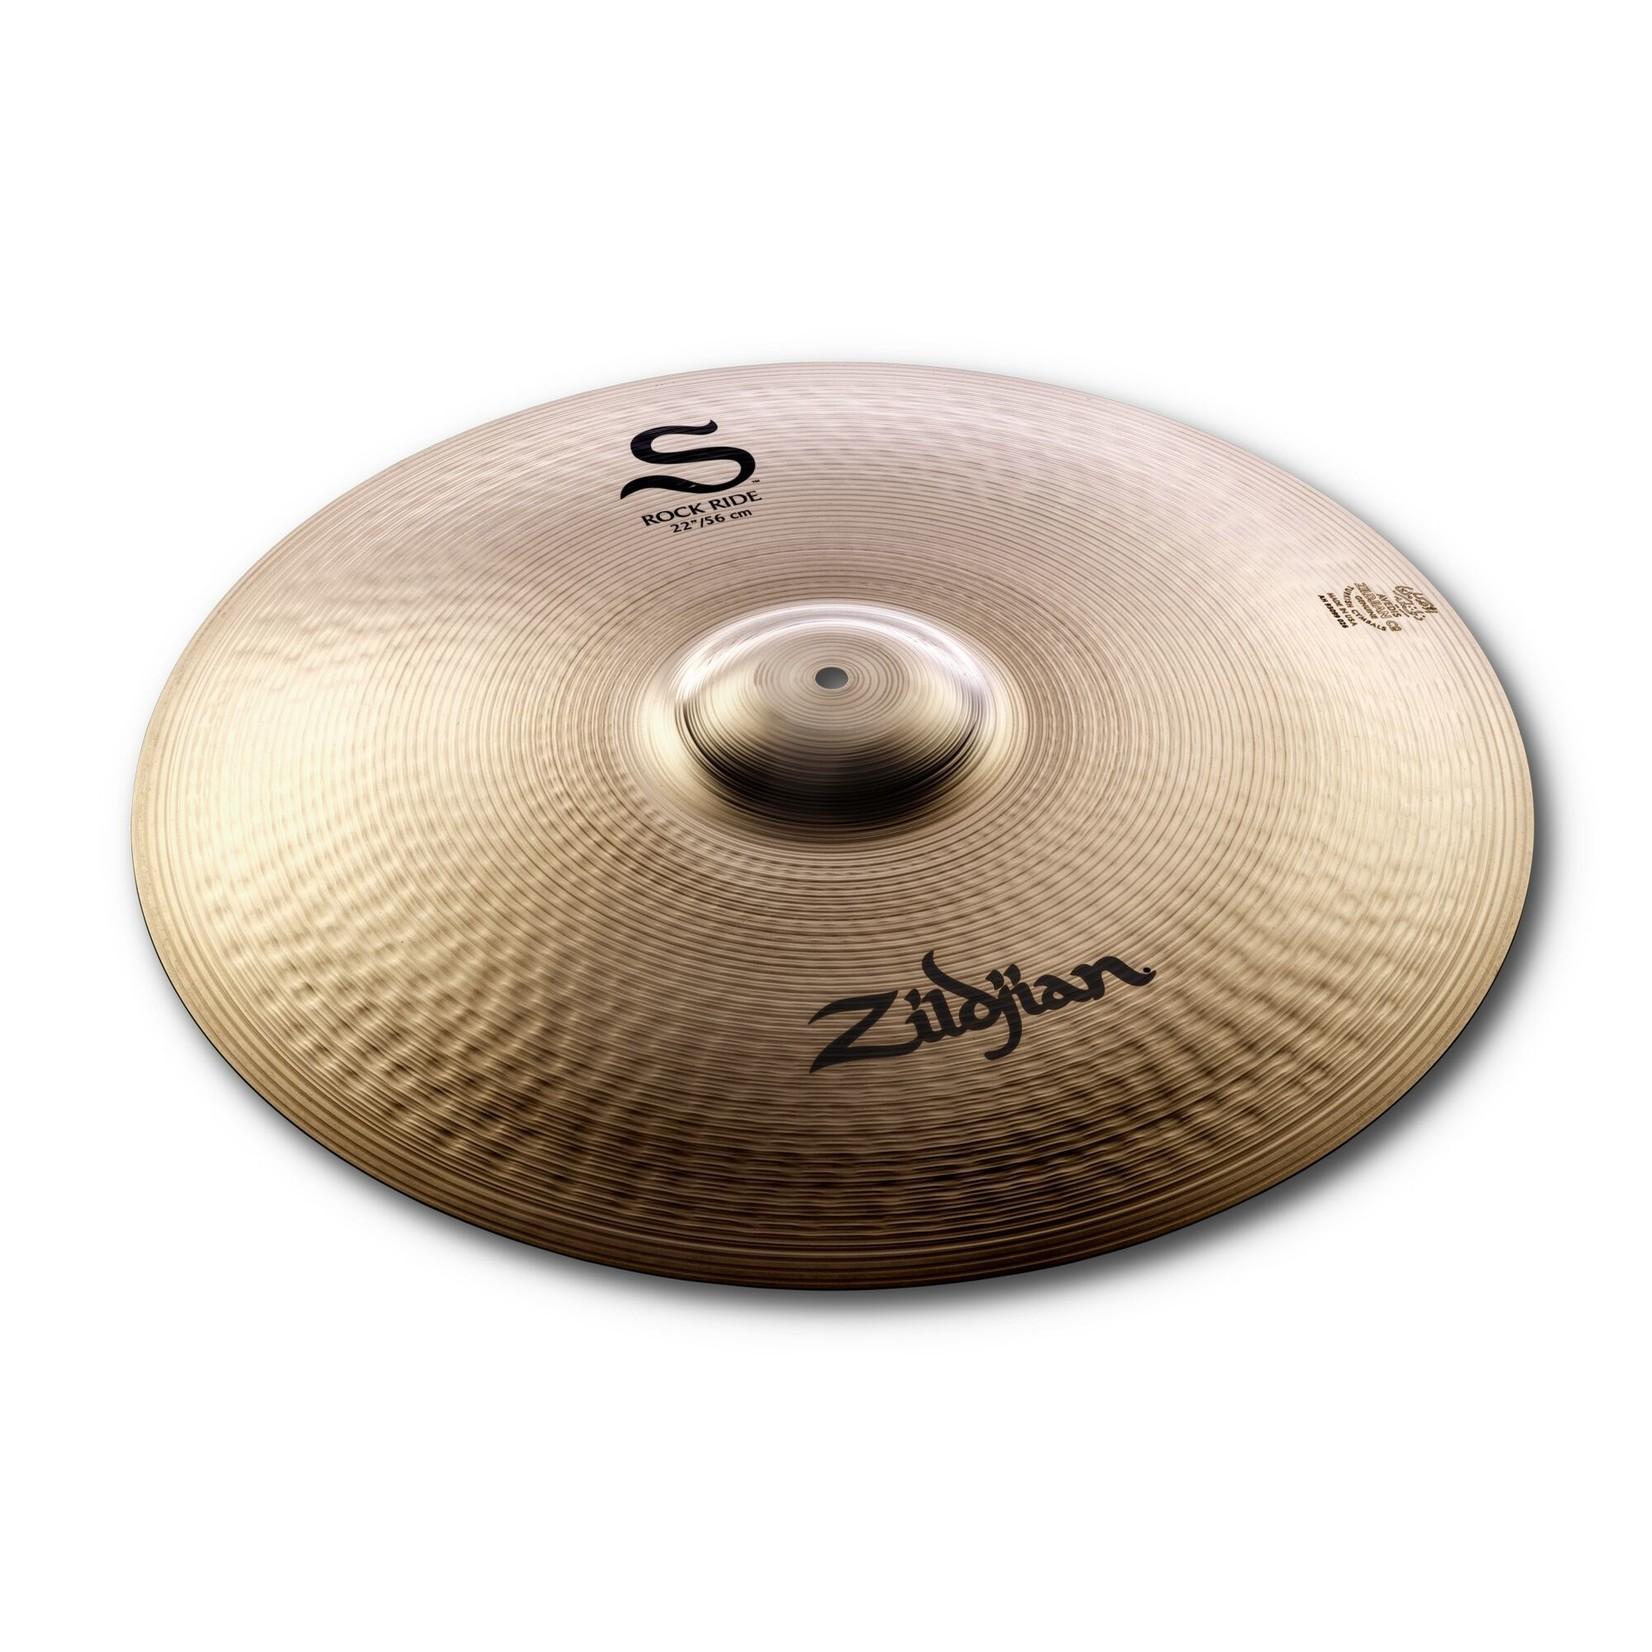 "Zildjian Zildjian 22"" S Rock Ride"